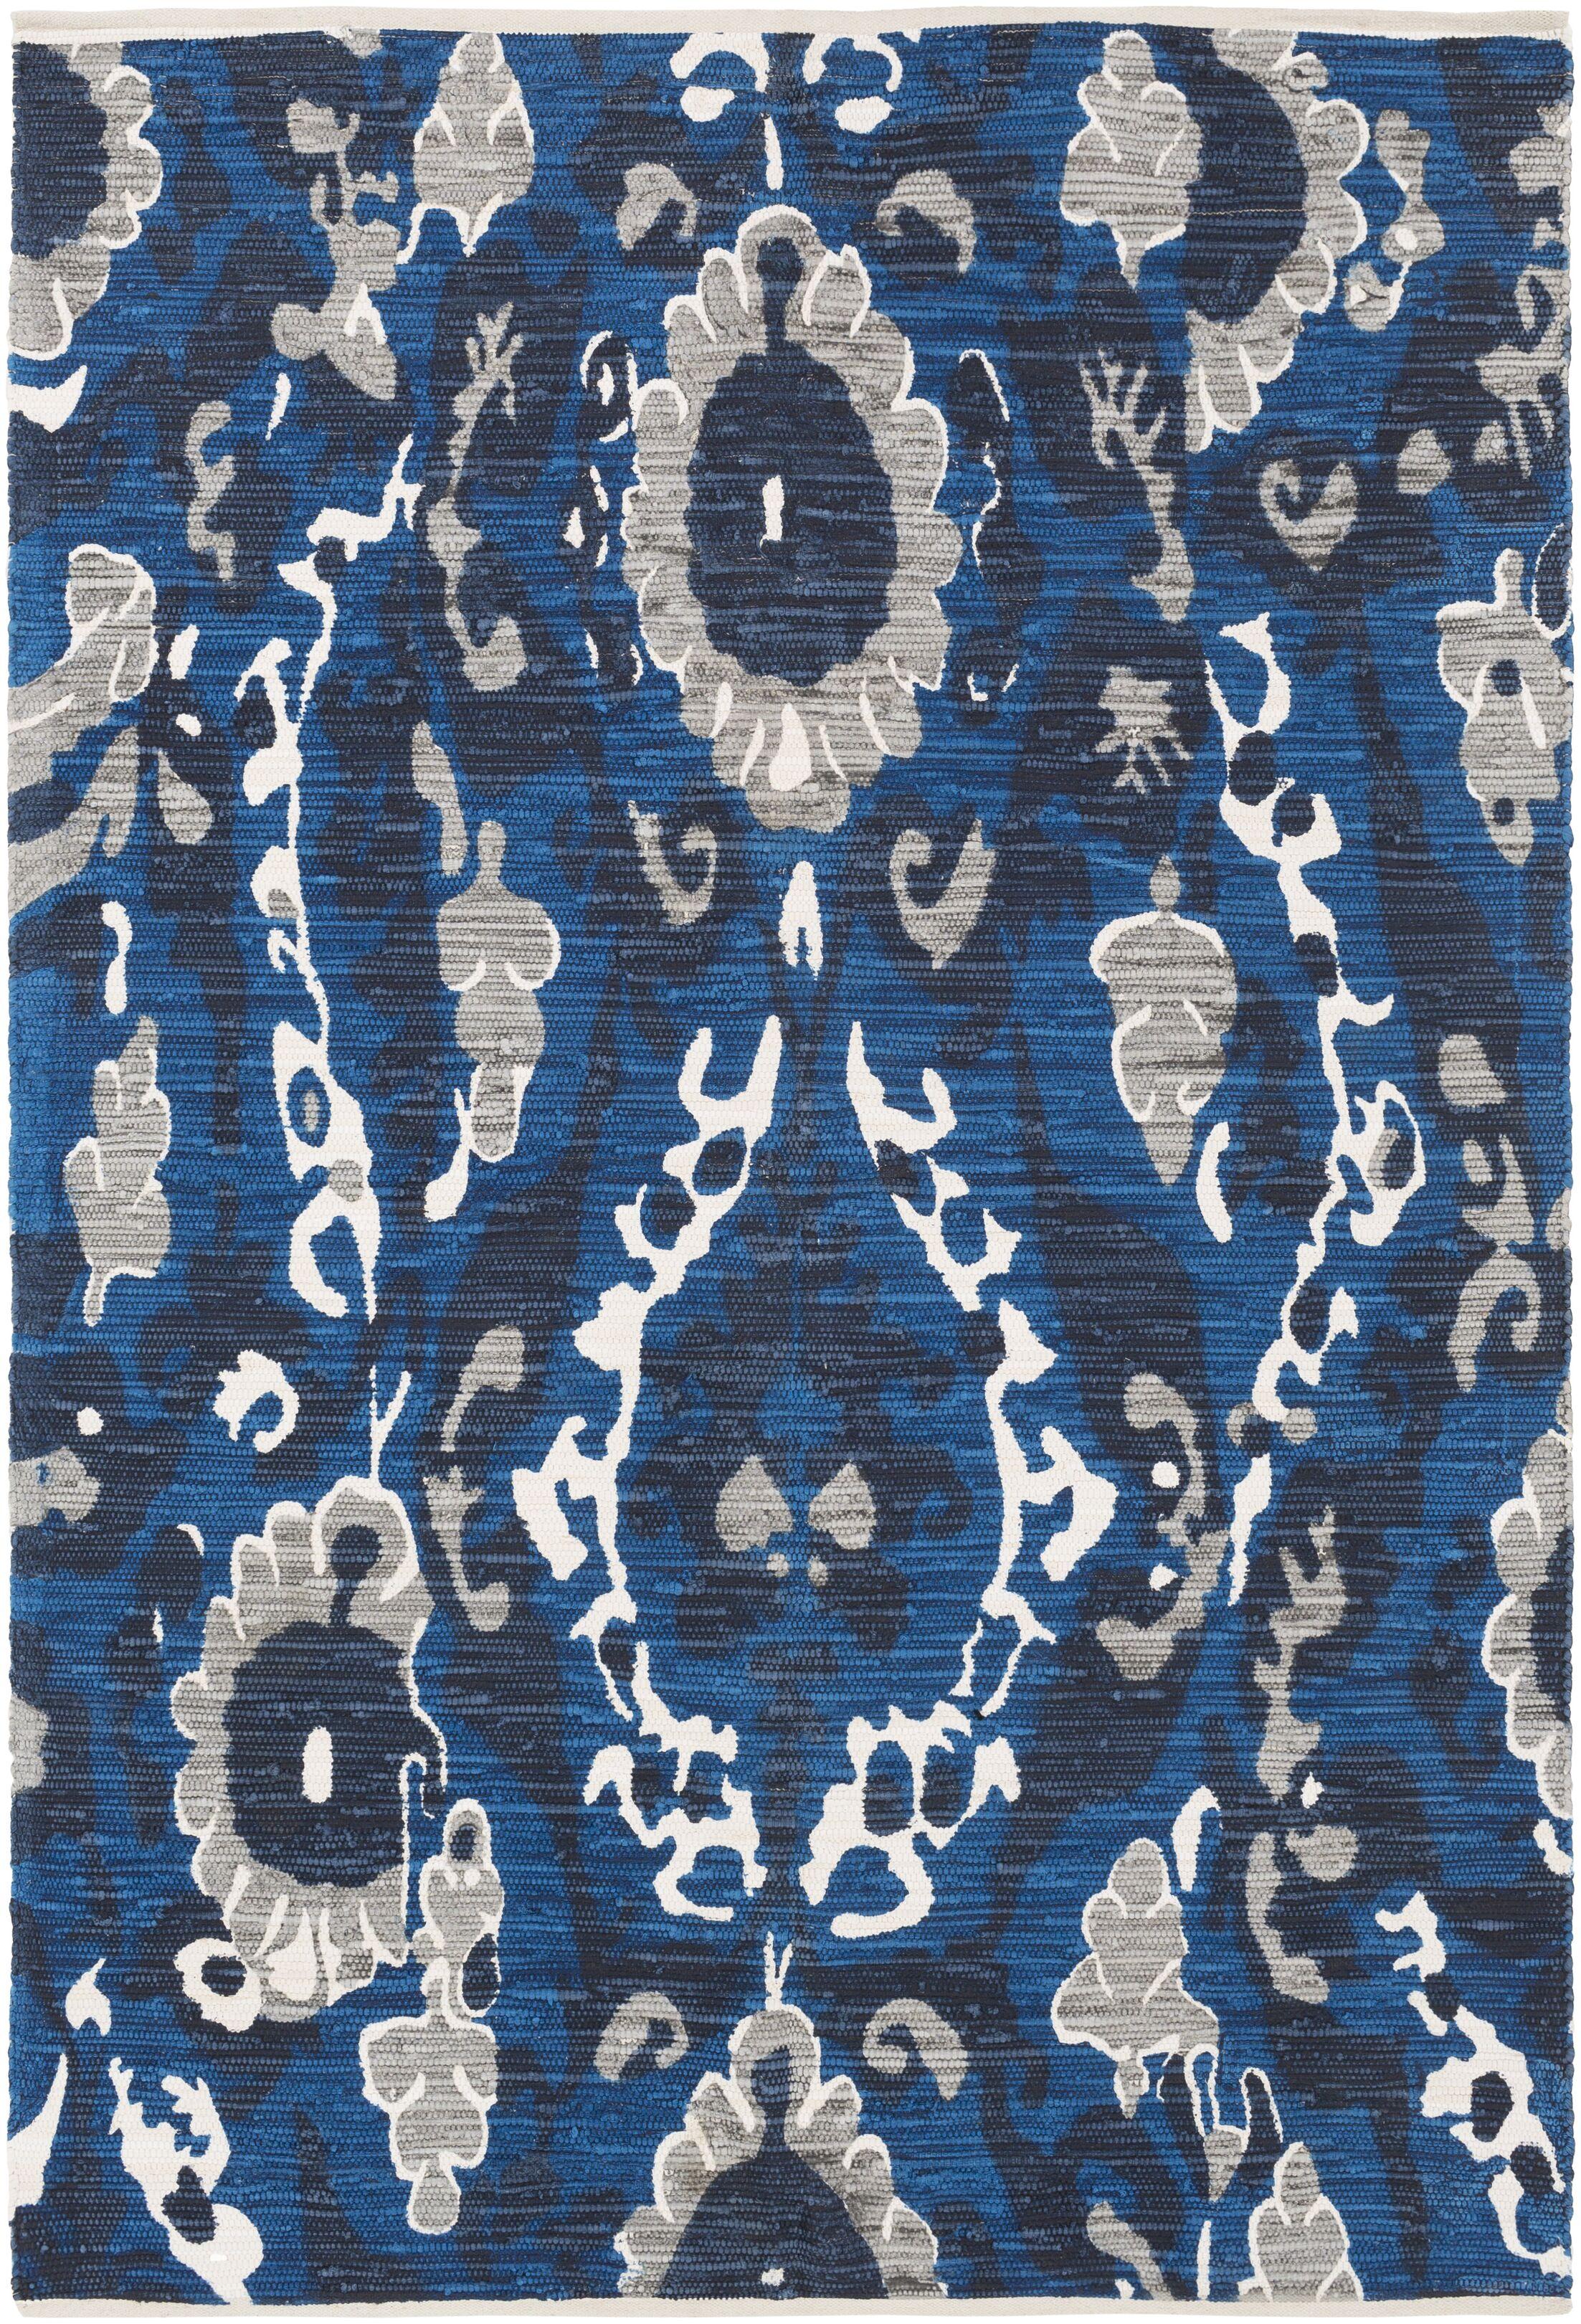 Juarez Hand-Woven Area Rug Rug Size: Rectangle 8' x 11'